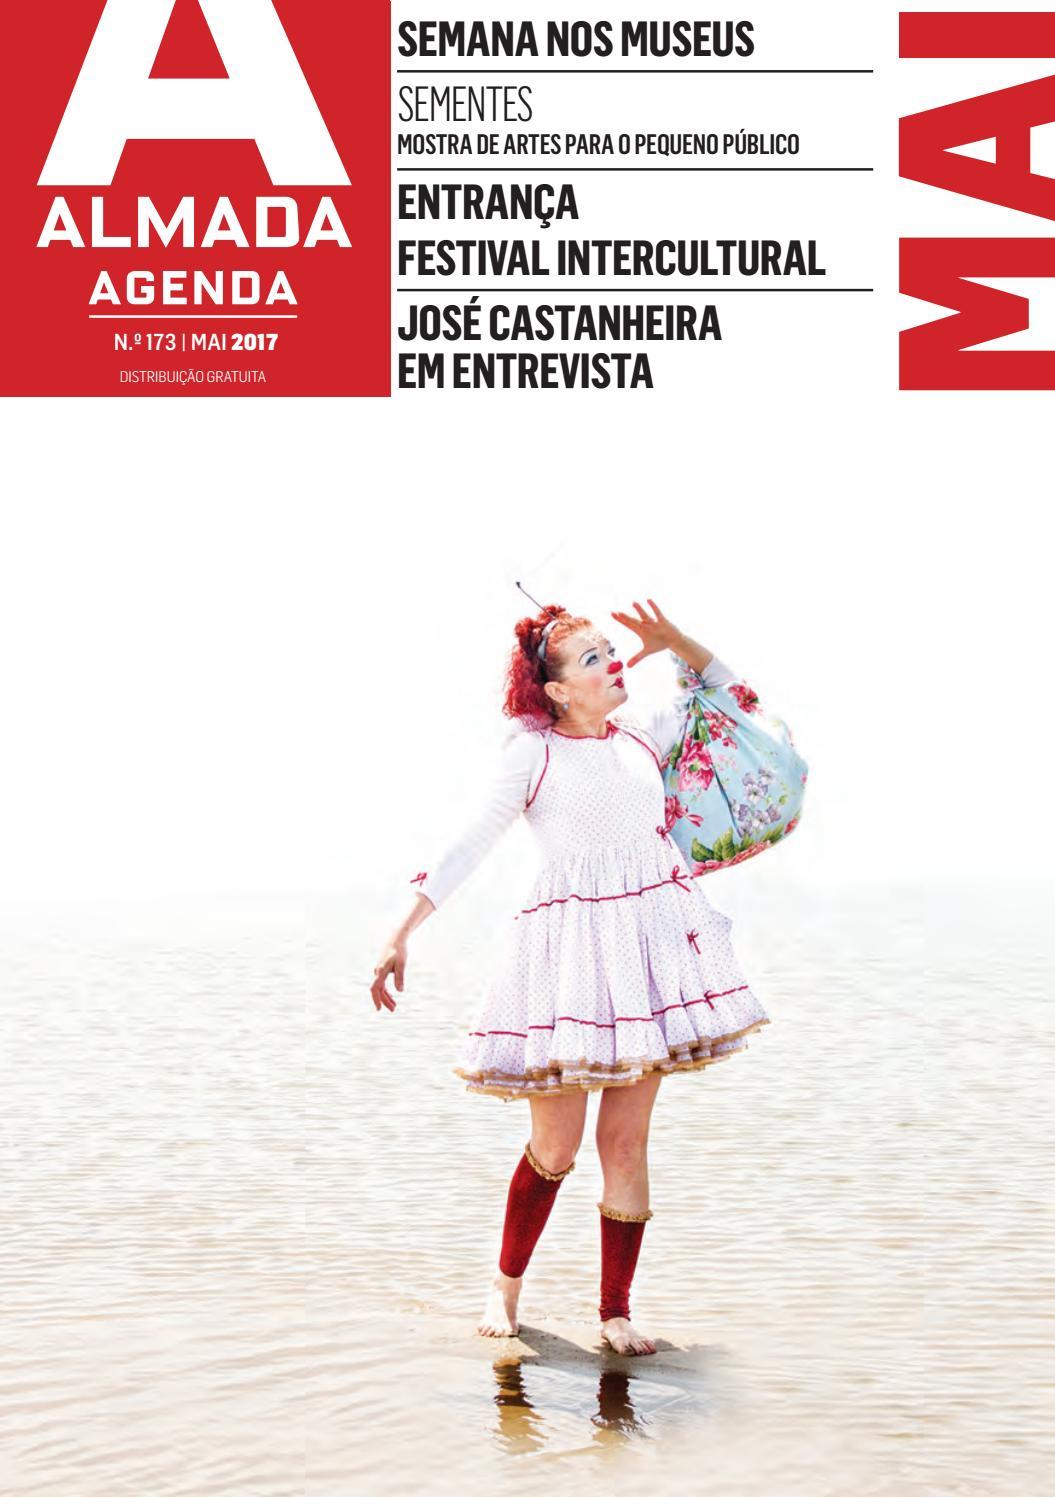 f26759e144 Agenda Almada N.º 173 - maio 2017 by Câmara Municipal de Almada - issuu